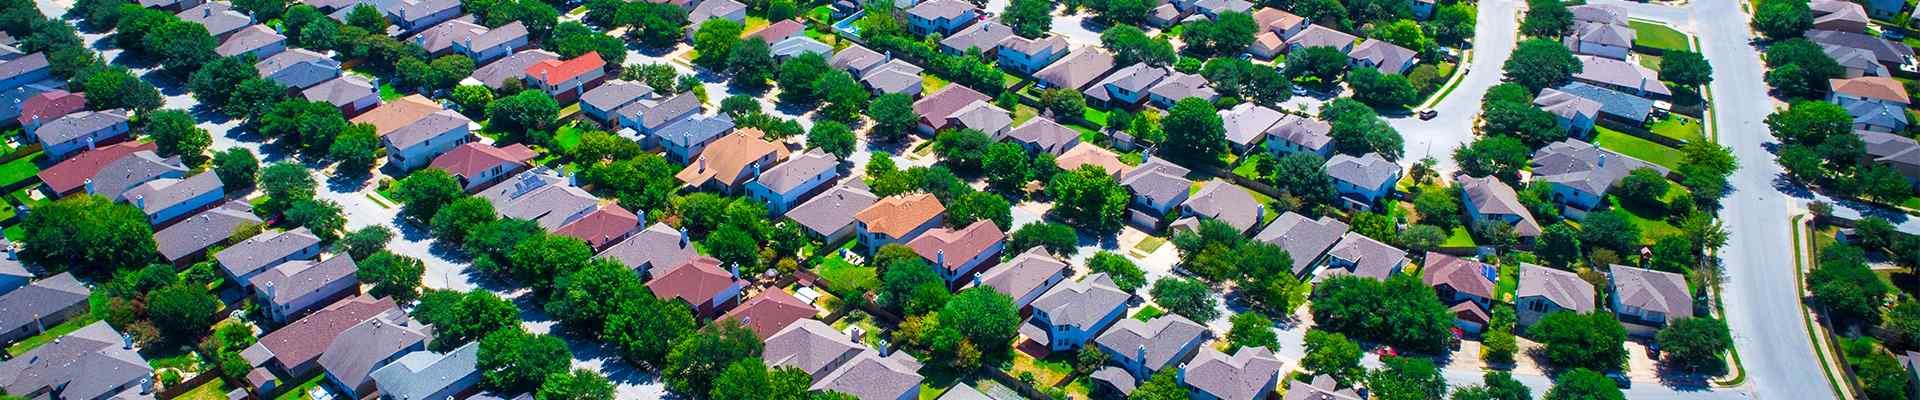 a suburban neighborhood in sachse texas